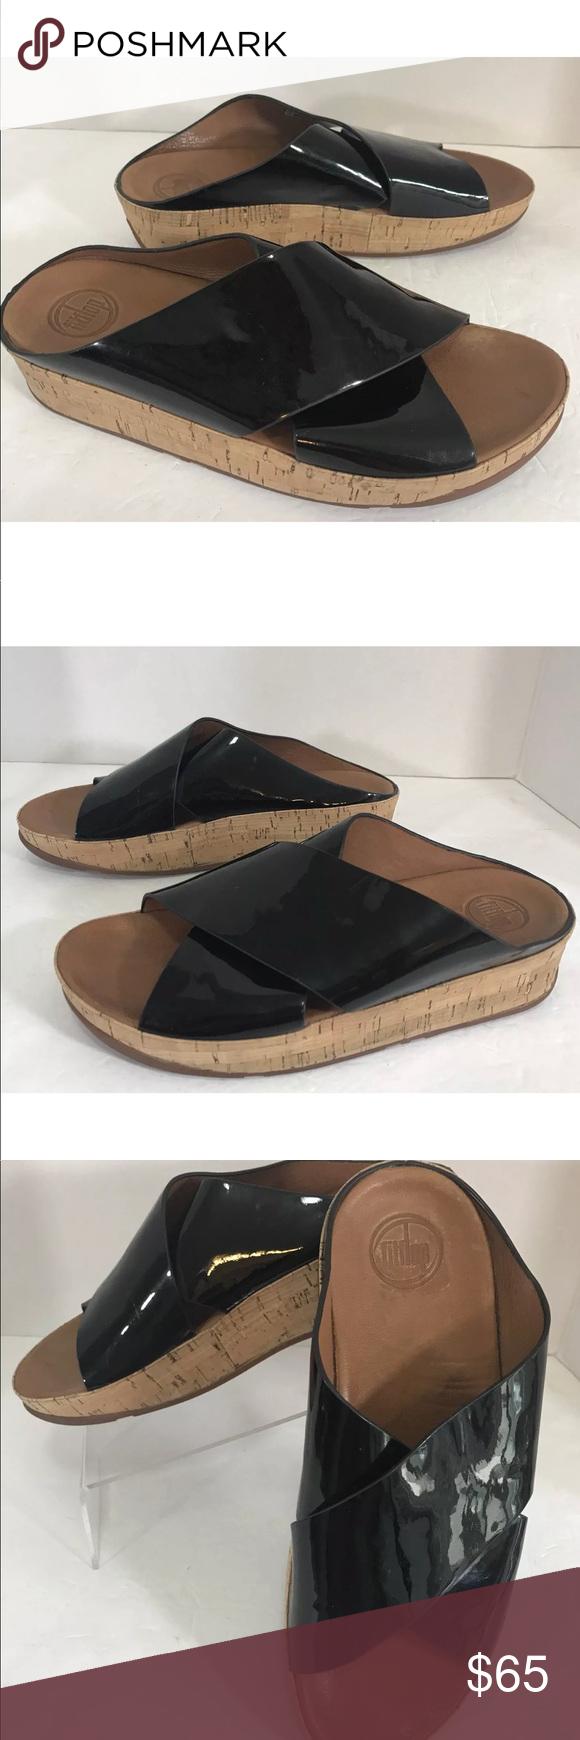 9014e8aeb FitFlop KYS Black Patent Crisscross Sandals Sz 9 FITFLOP CROSSOVER SLIDES  SHOES